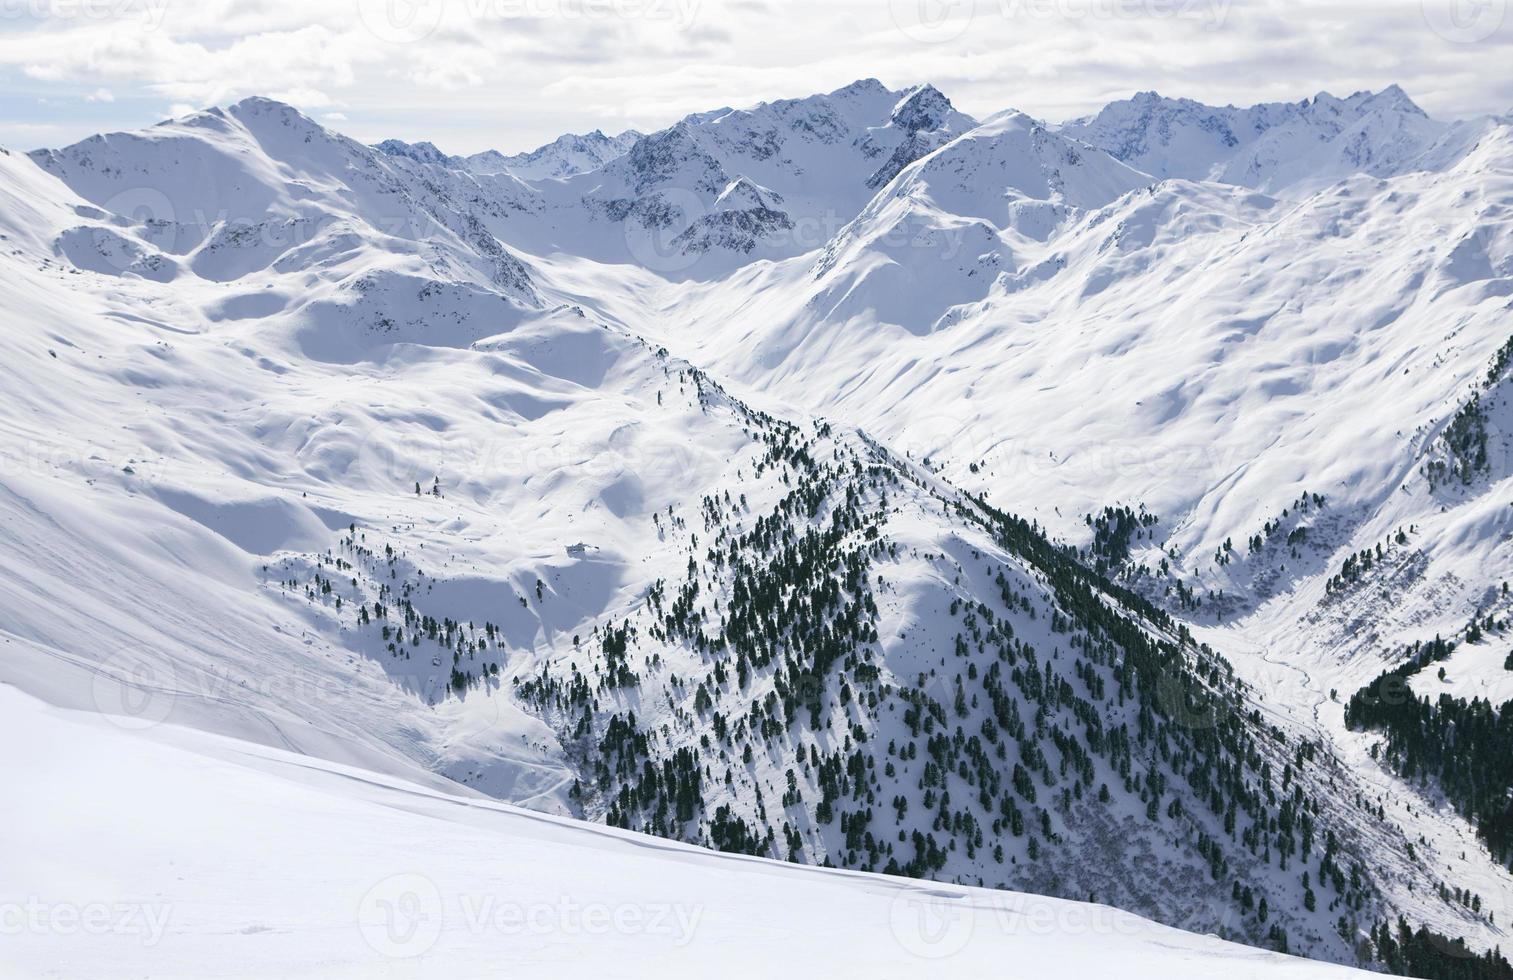 vista da cordilheira nevada foto